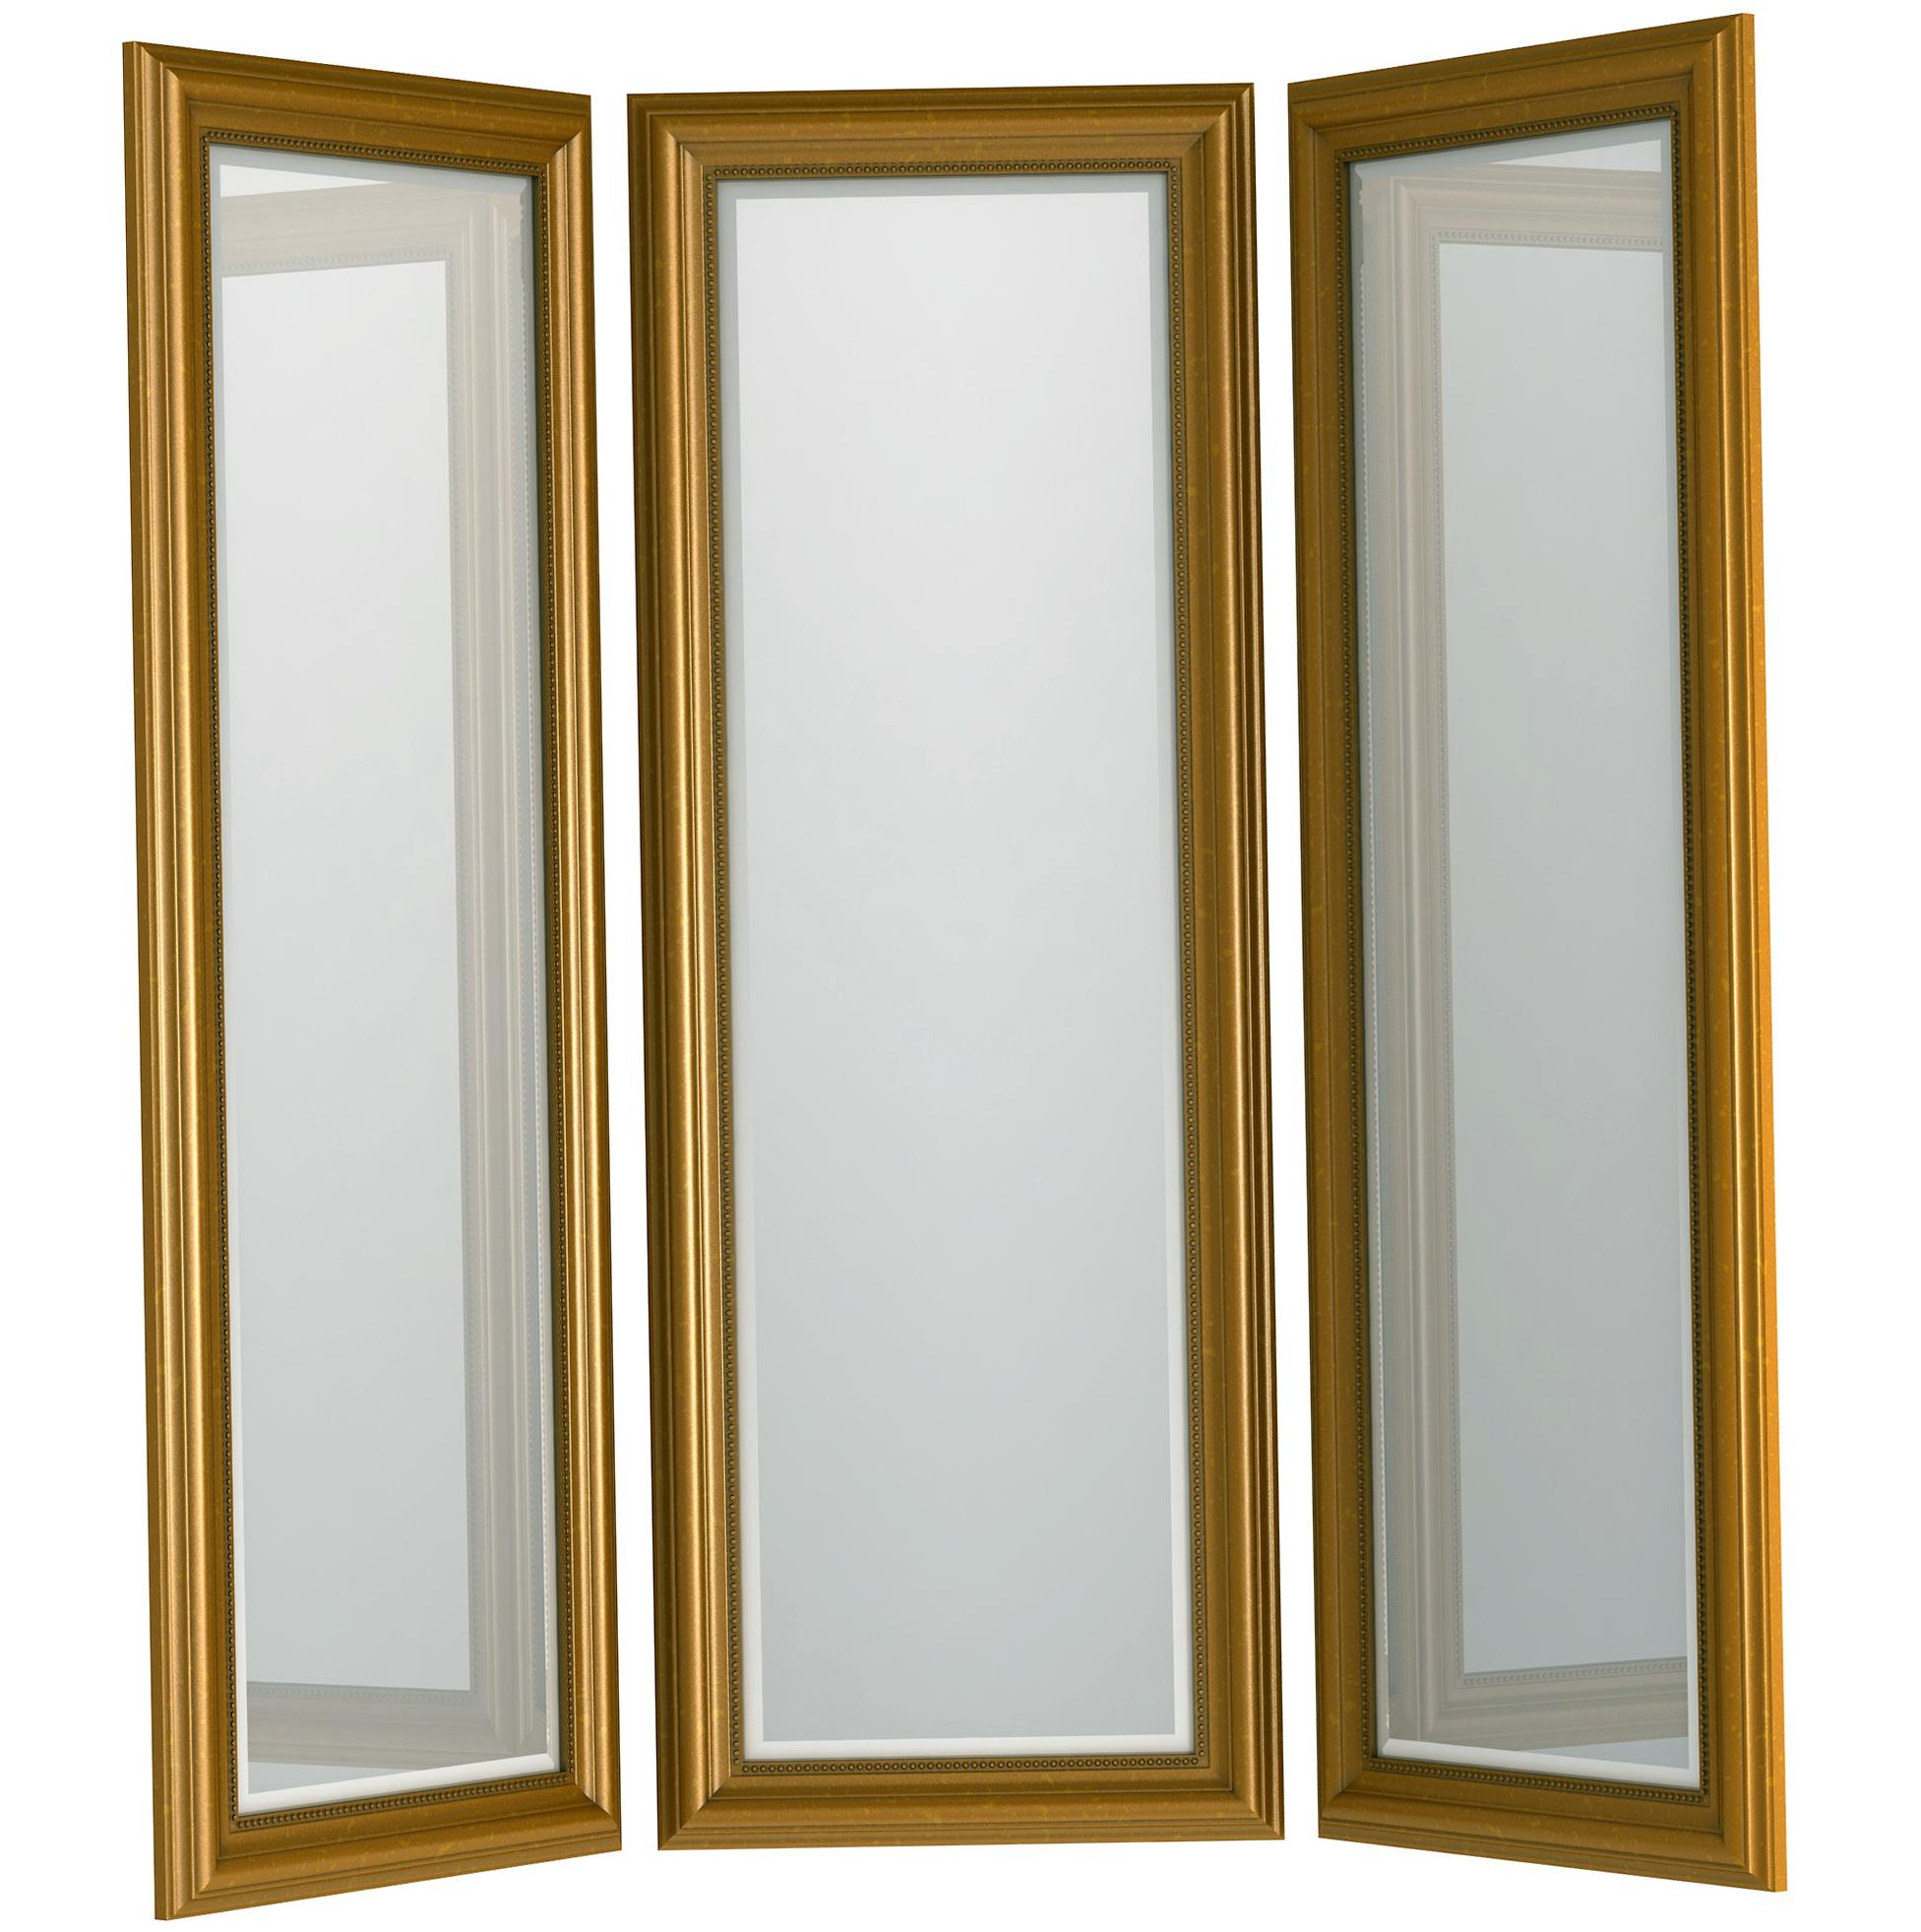 tri fold mirror full length ikea home design ideas. Black Bedroom Furniture Sets. Home Design Ideas